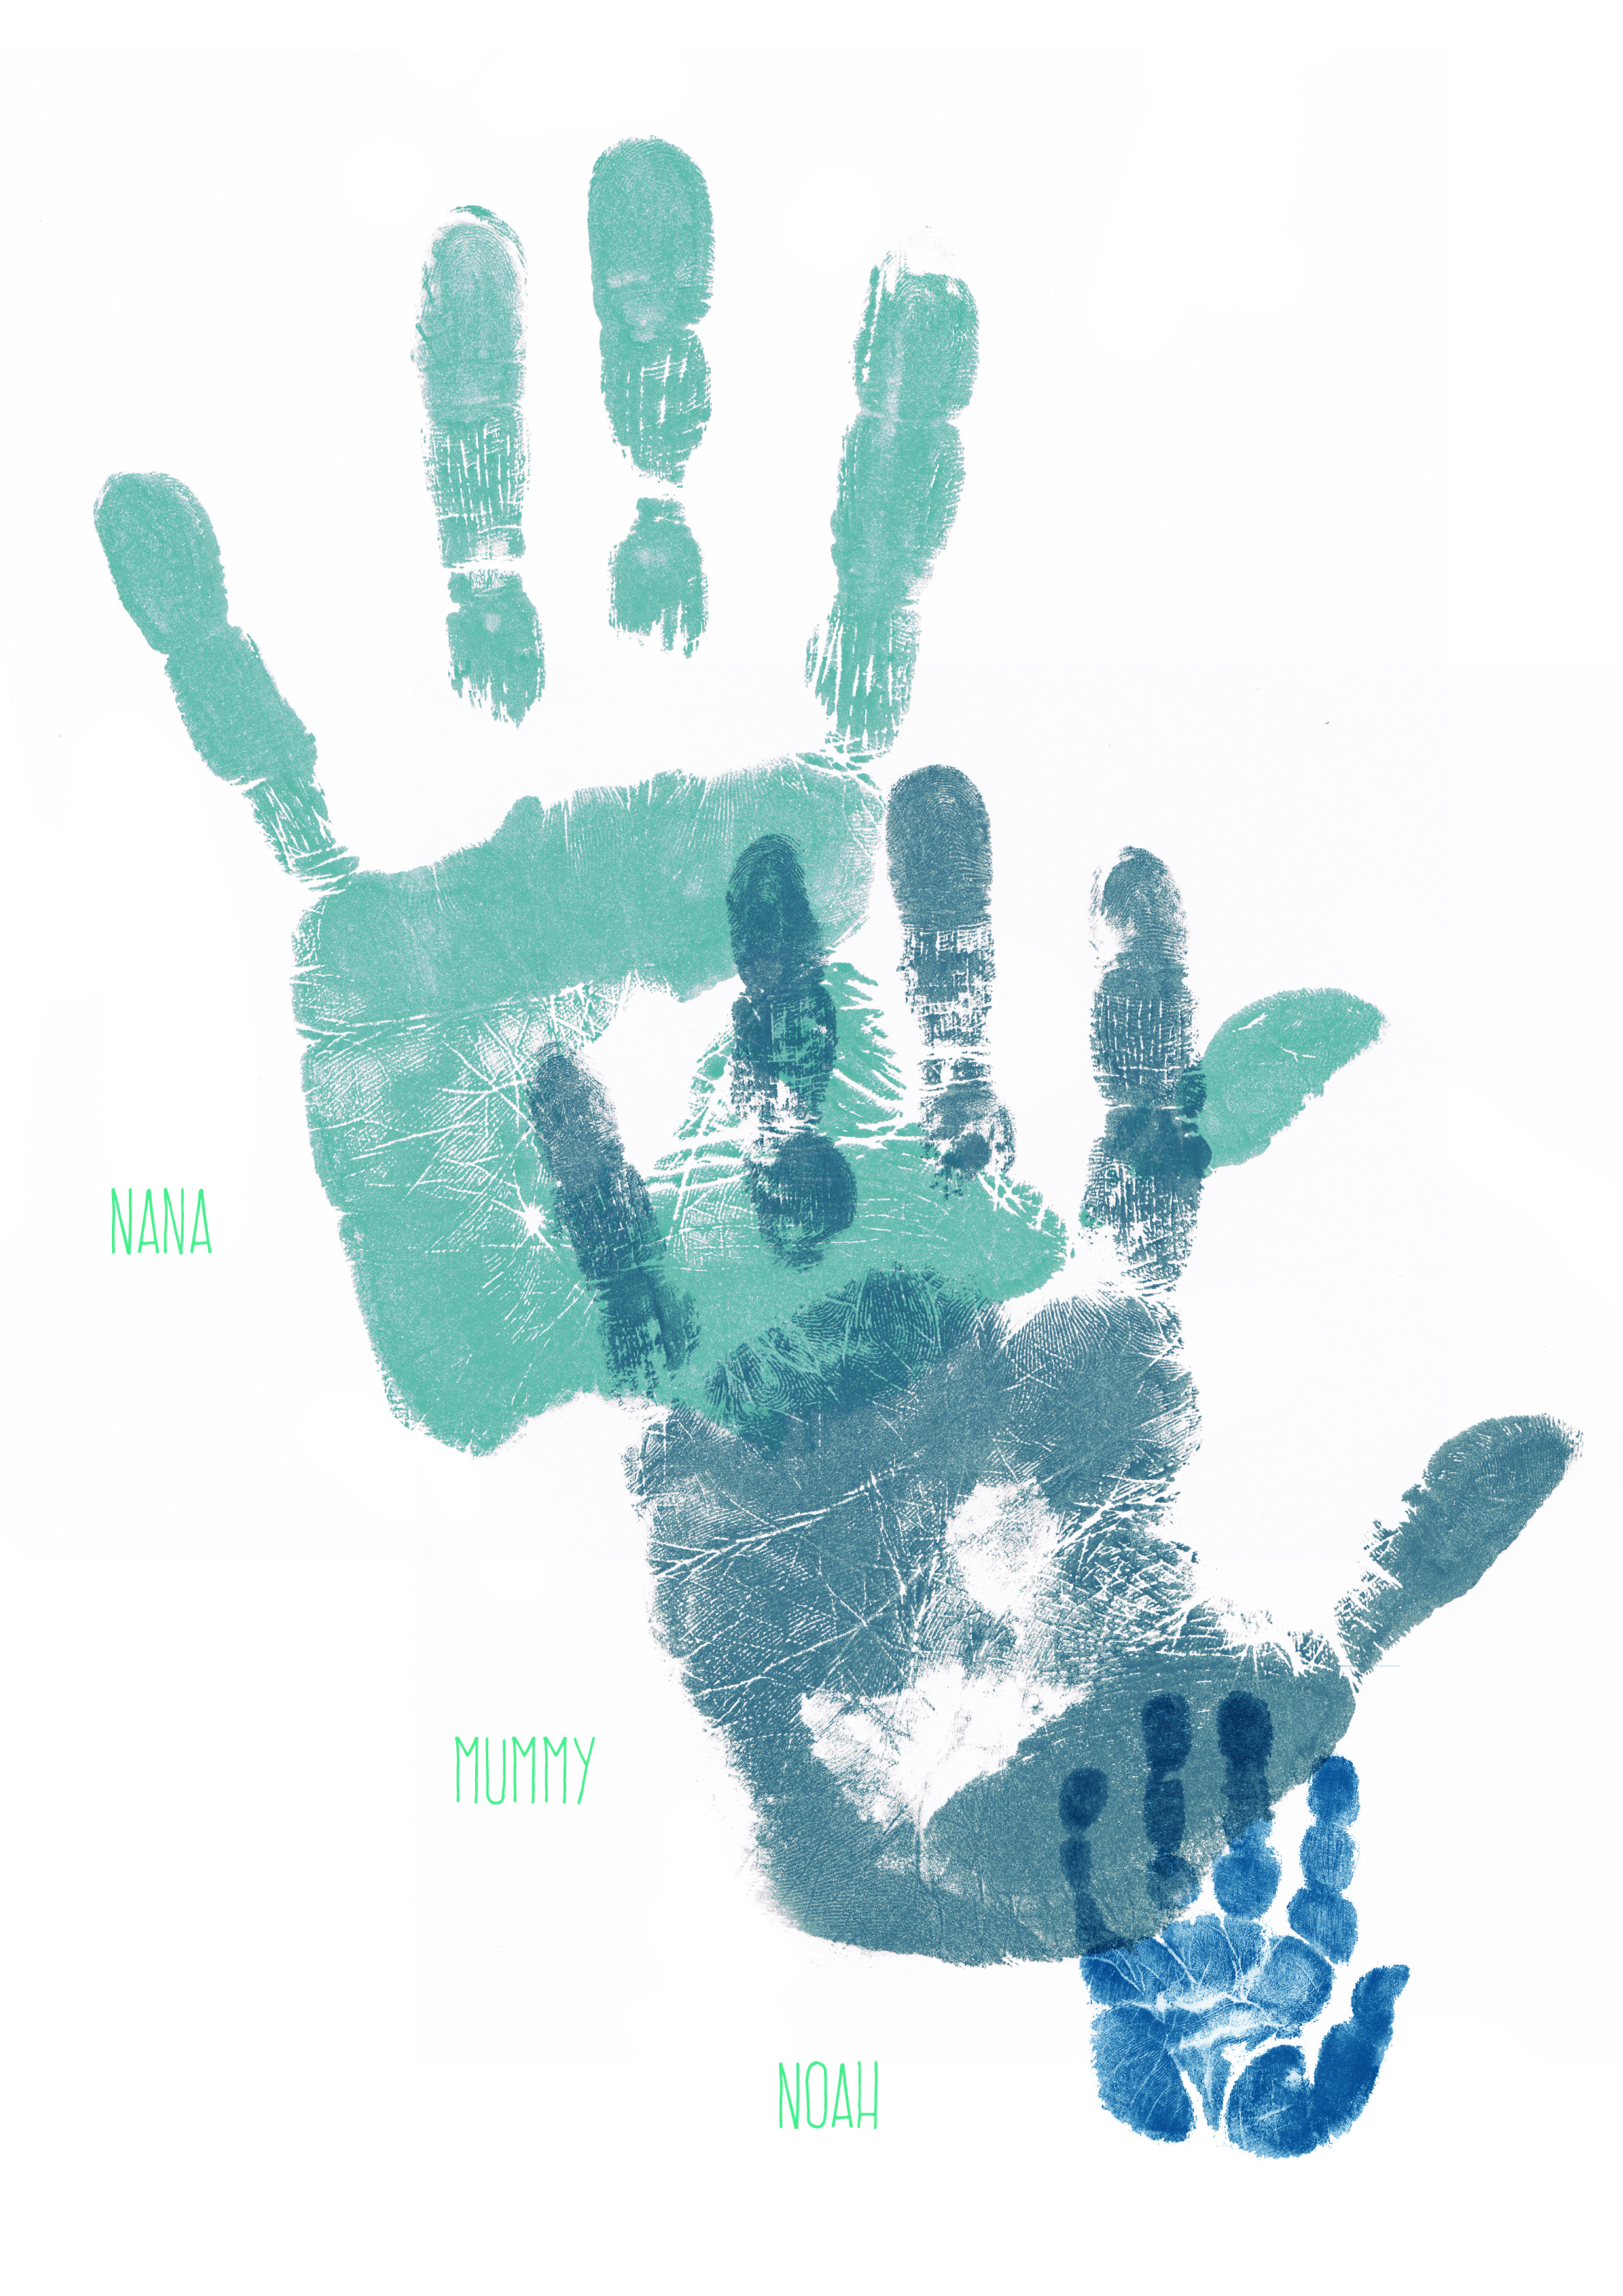 GENERATION PRINT WITH NANA